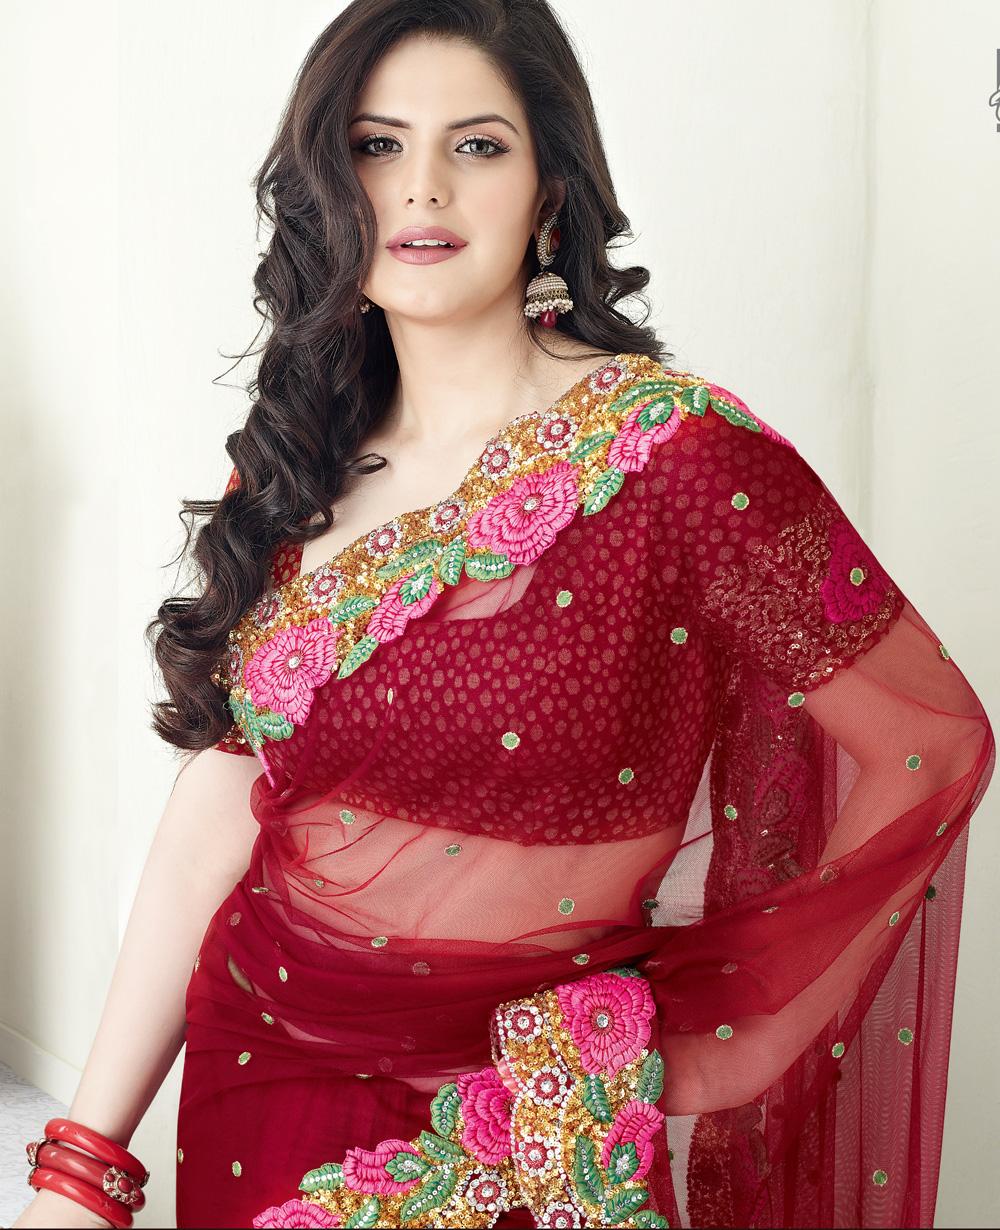 zarin khan photoshoot in sari   missy lovesx3